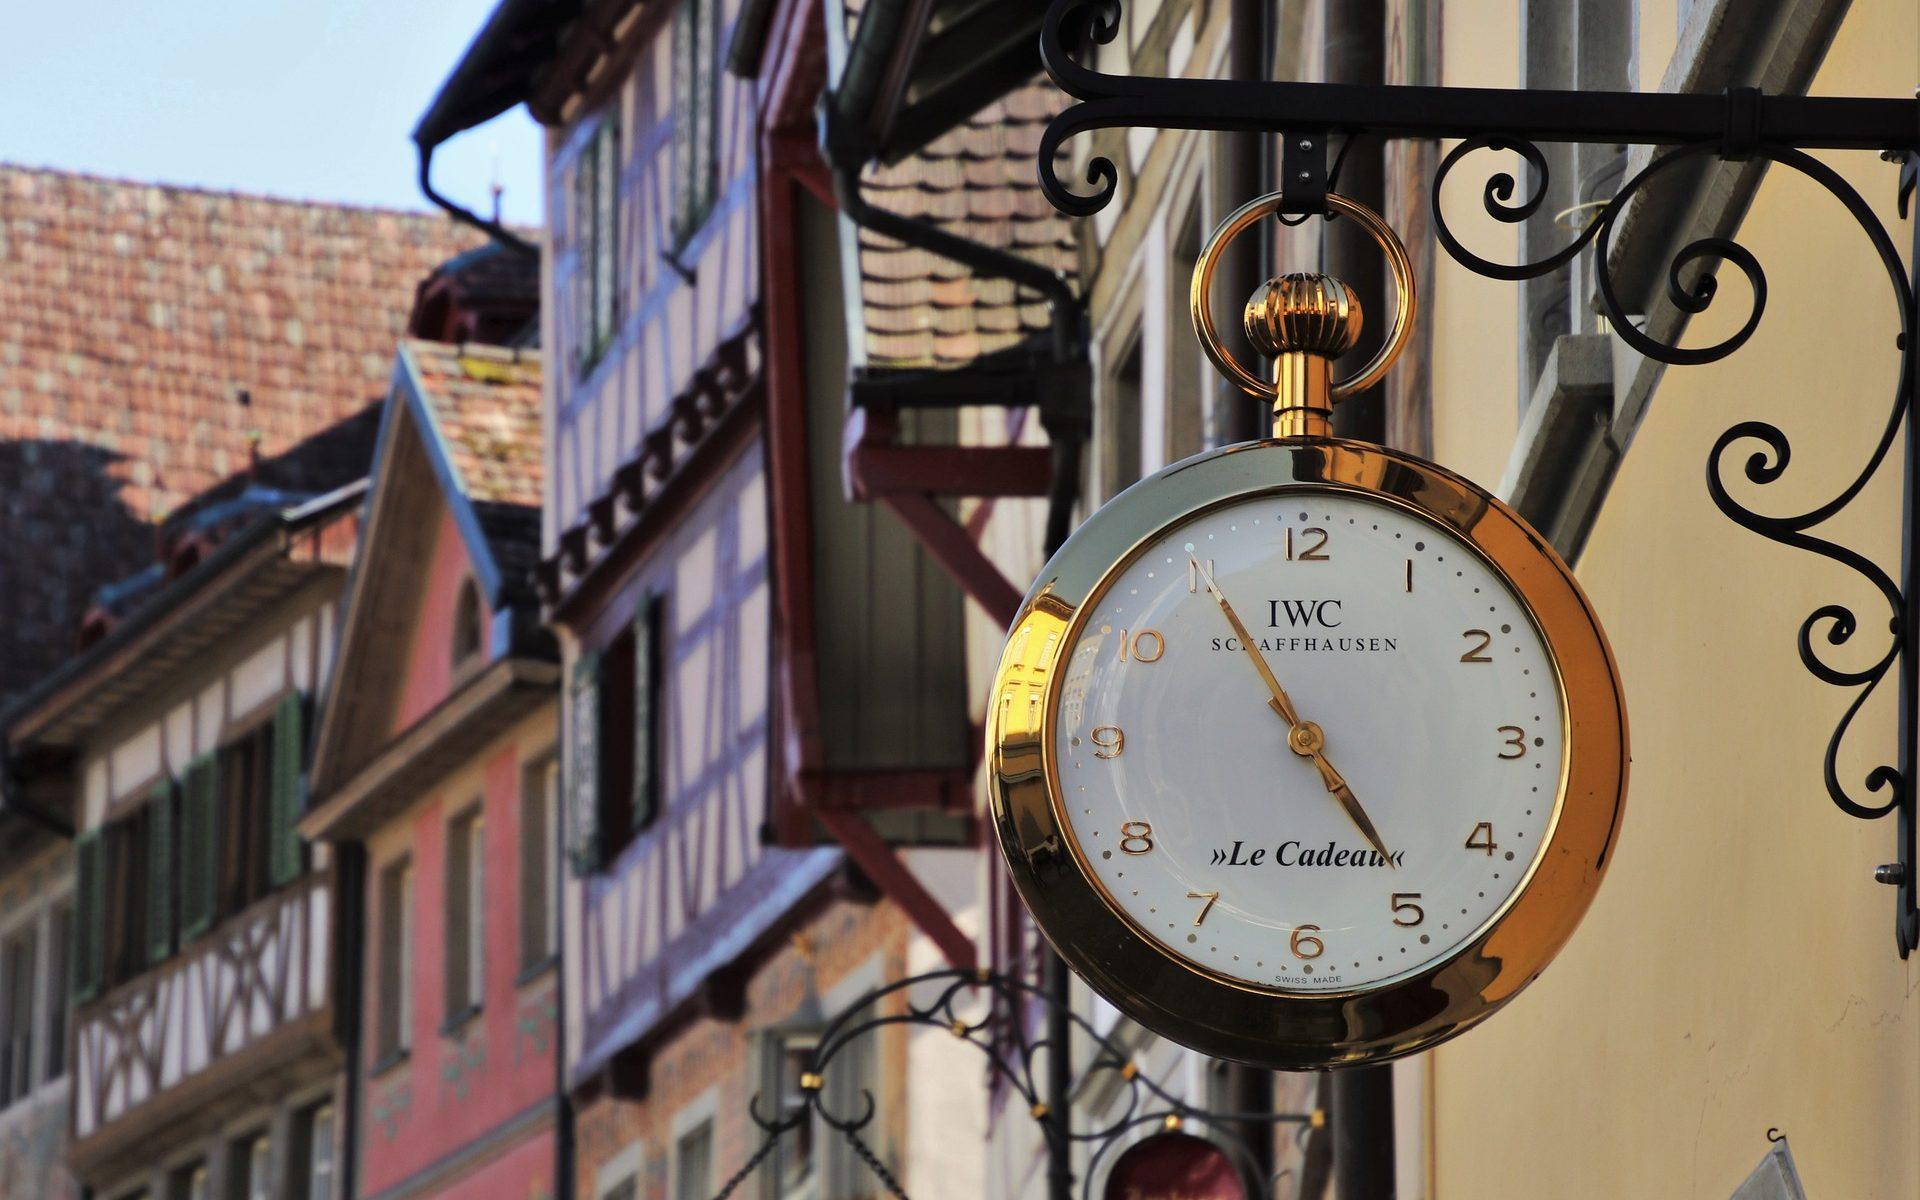 Traductions professionnelles à Stein am Rhein